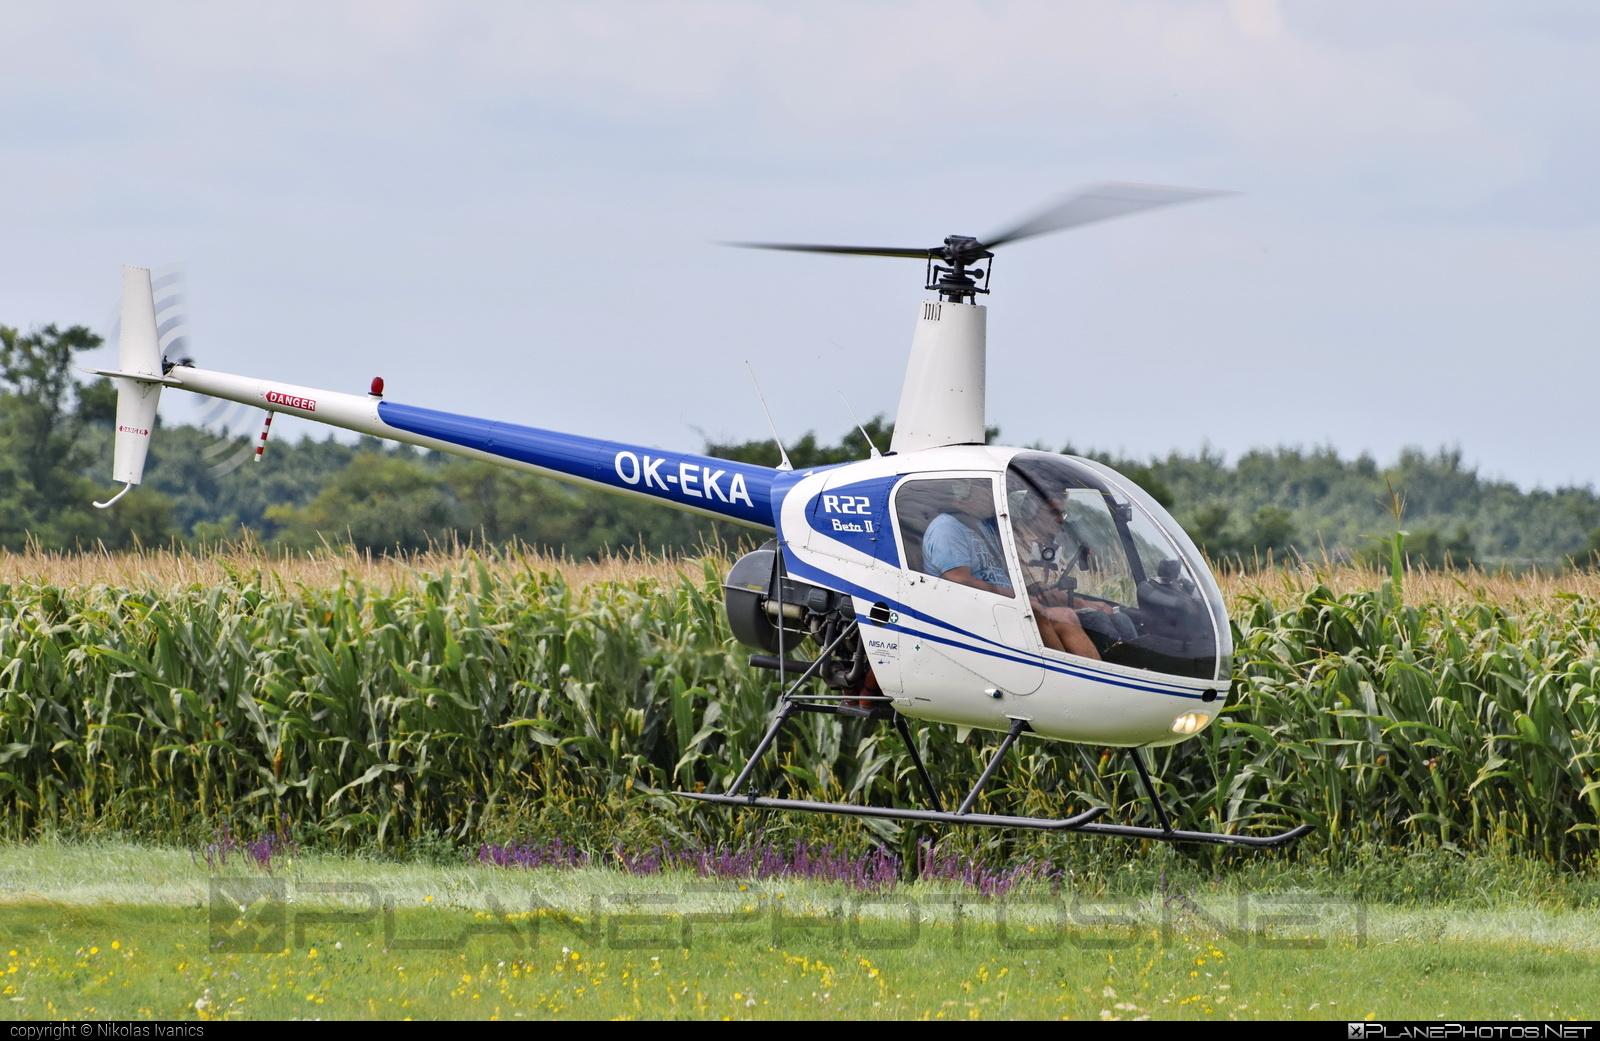 Robinson R22 Beta II - OK-EKA operated by Nisa Air #robinson